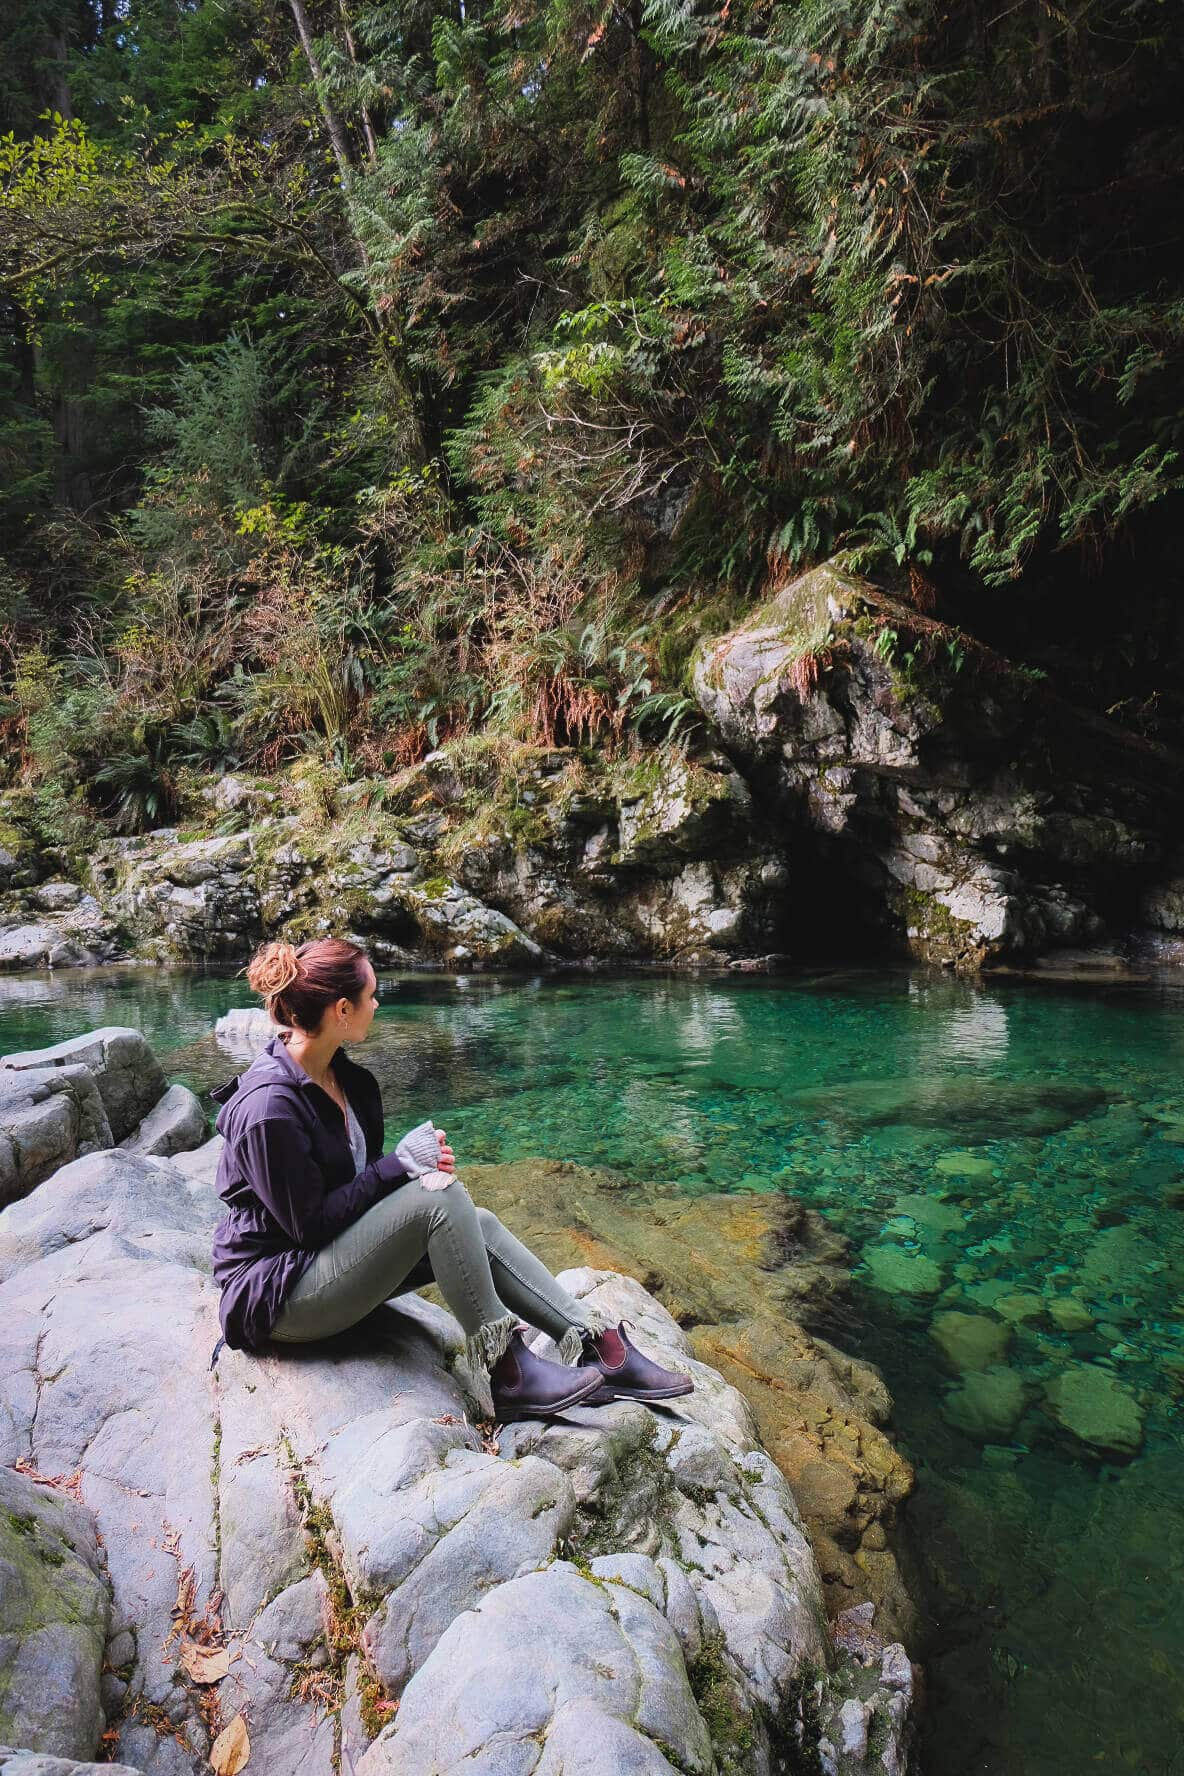 Exploring around Vancouver, British Columbia